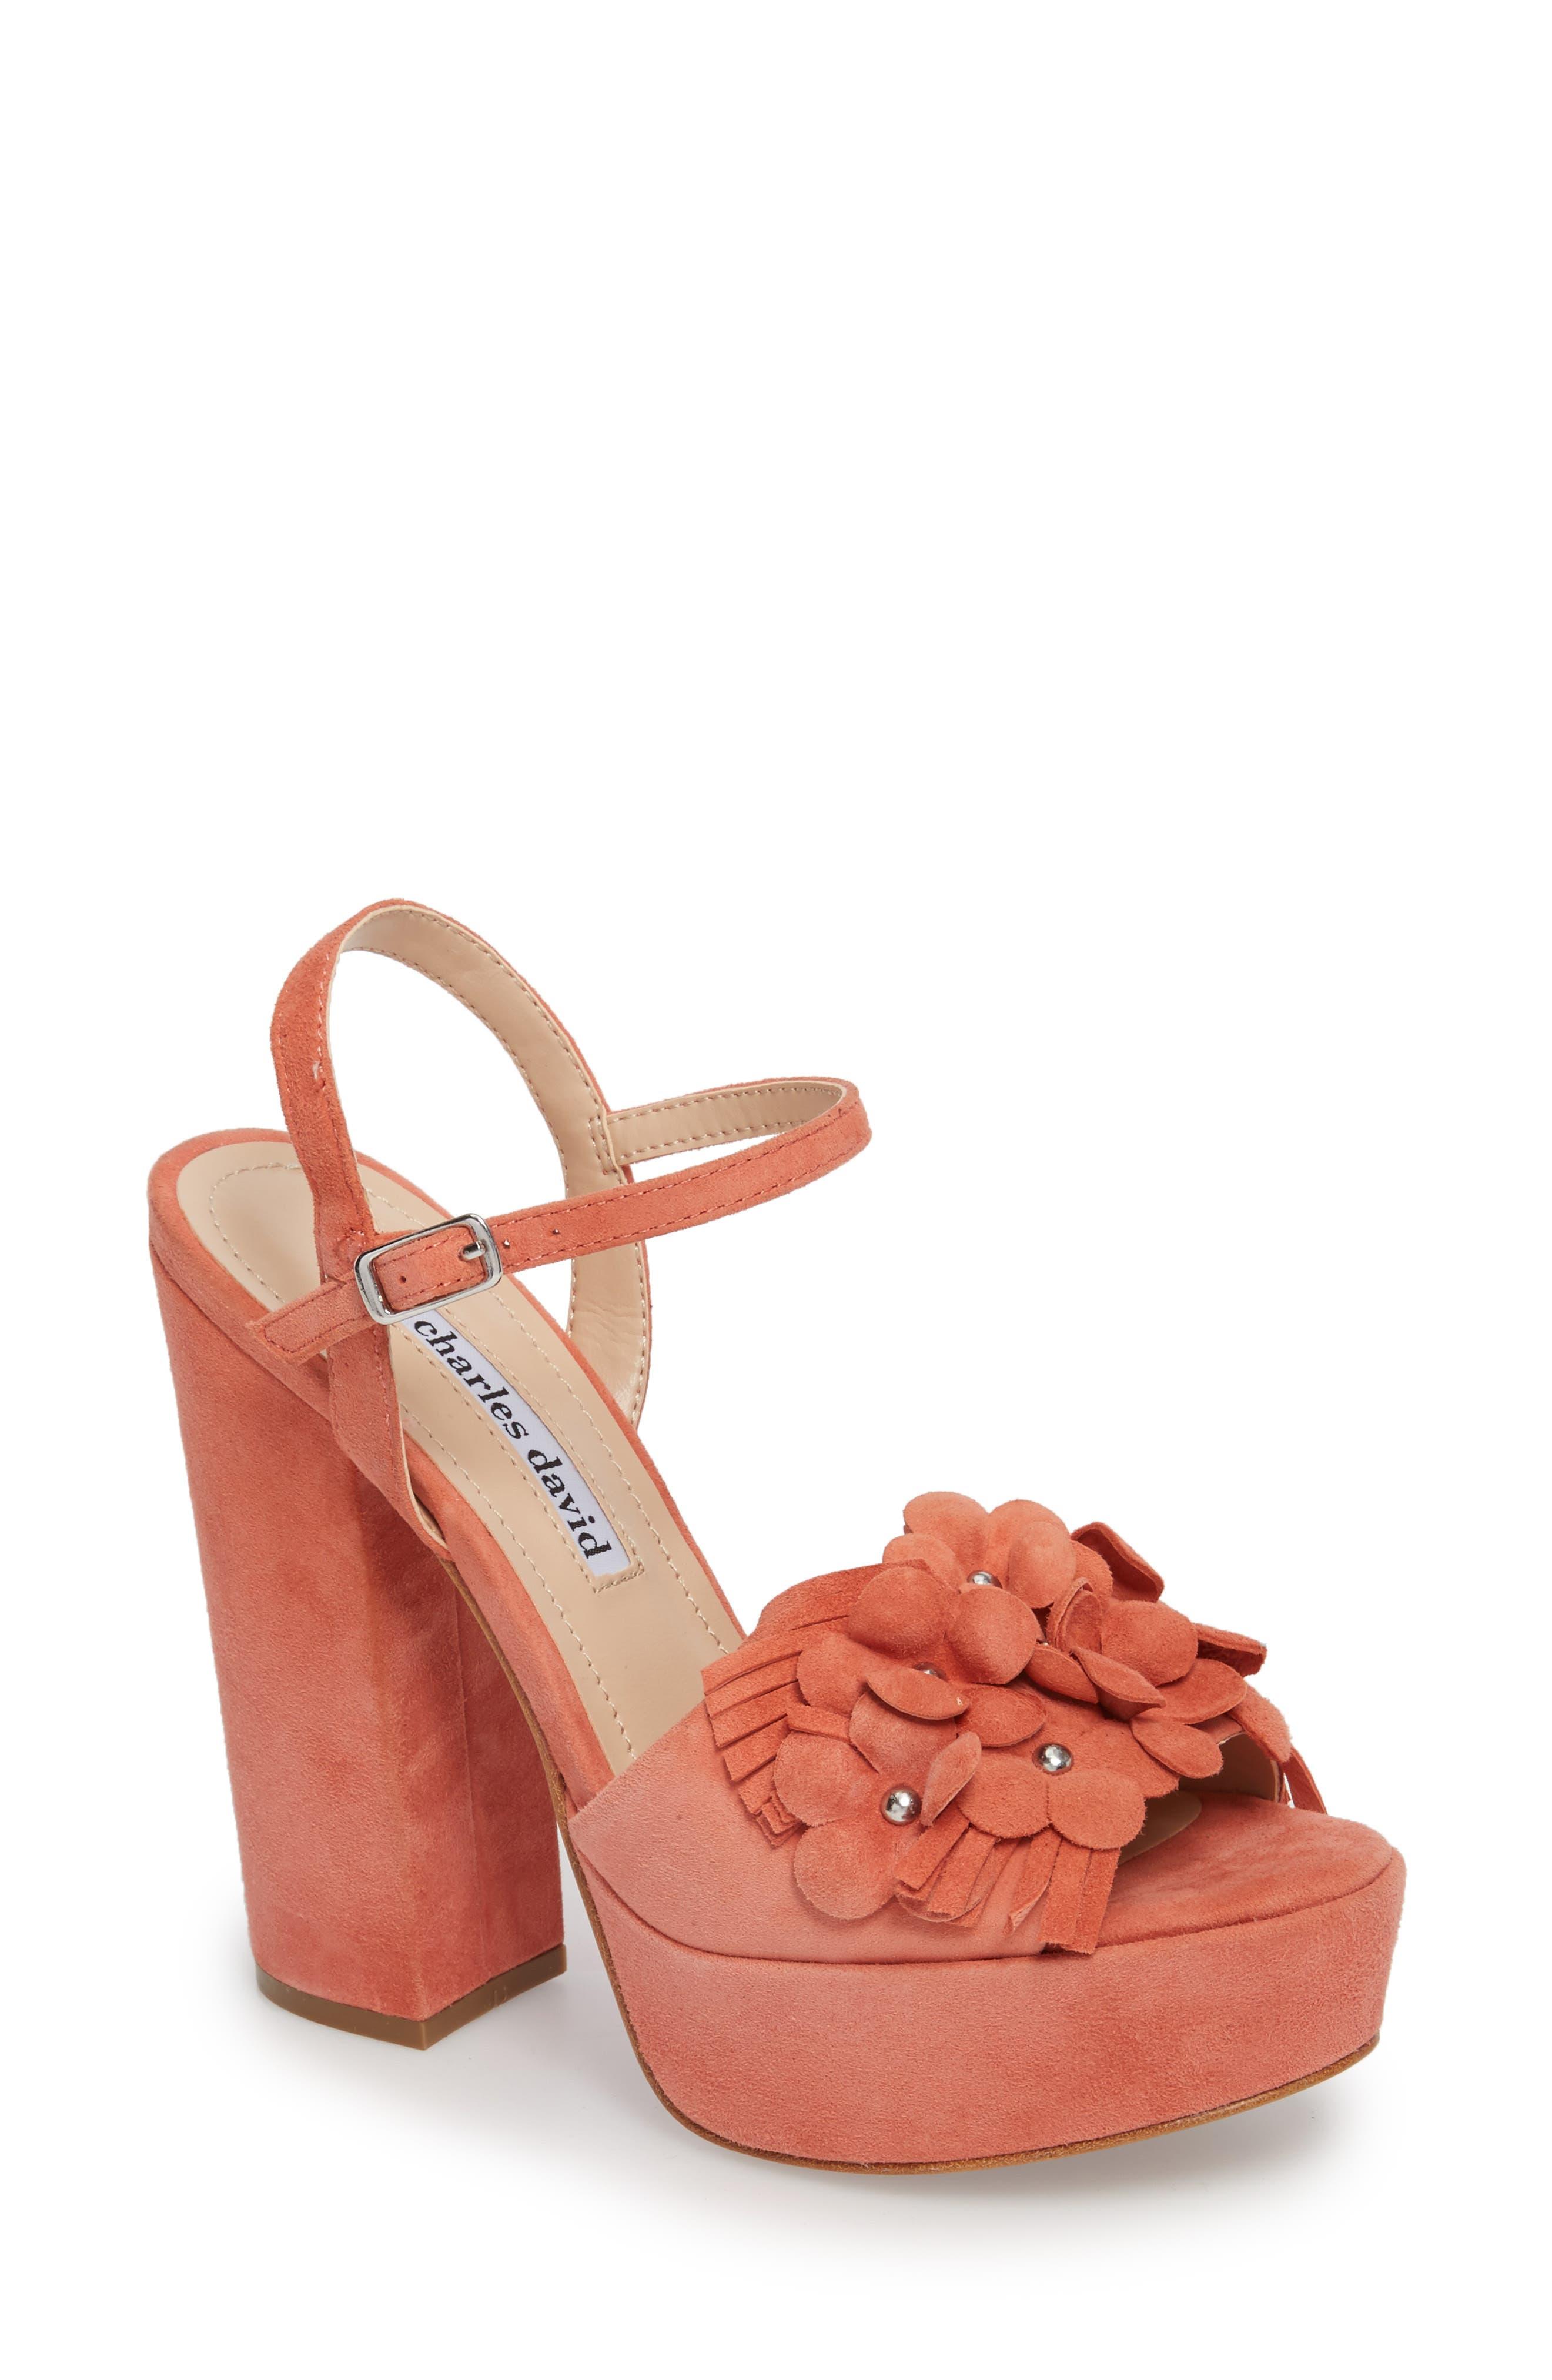 Charles David Royale Sandal- Coral